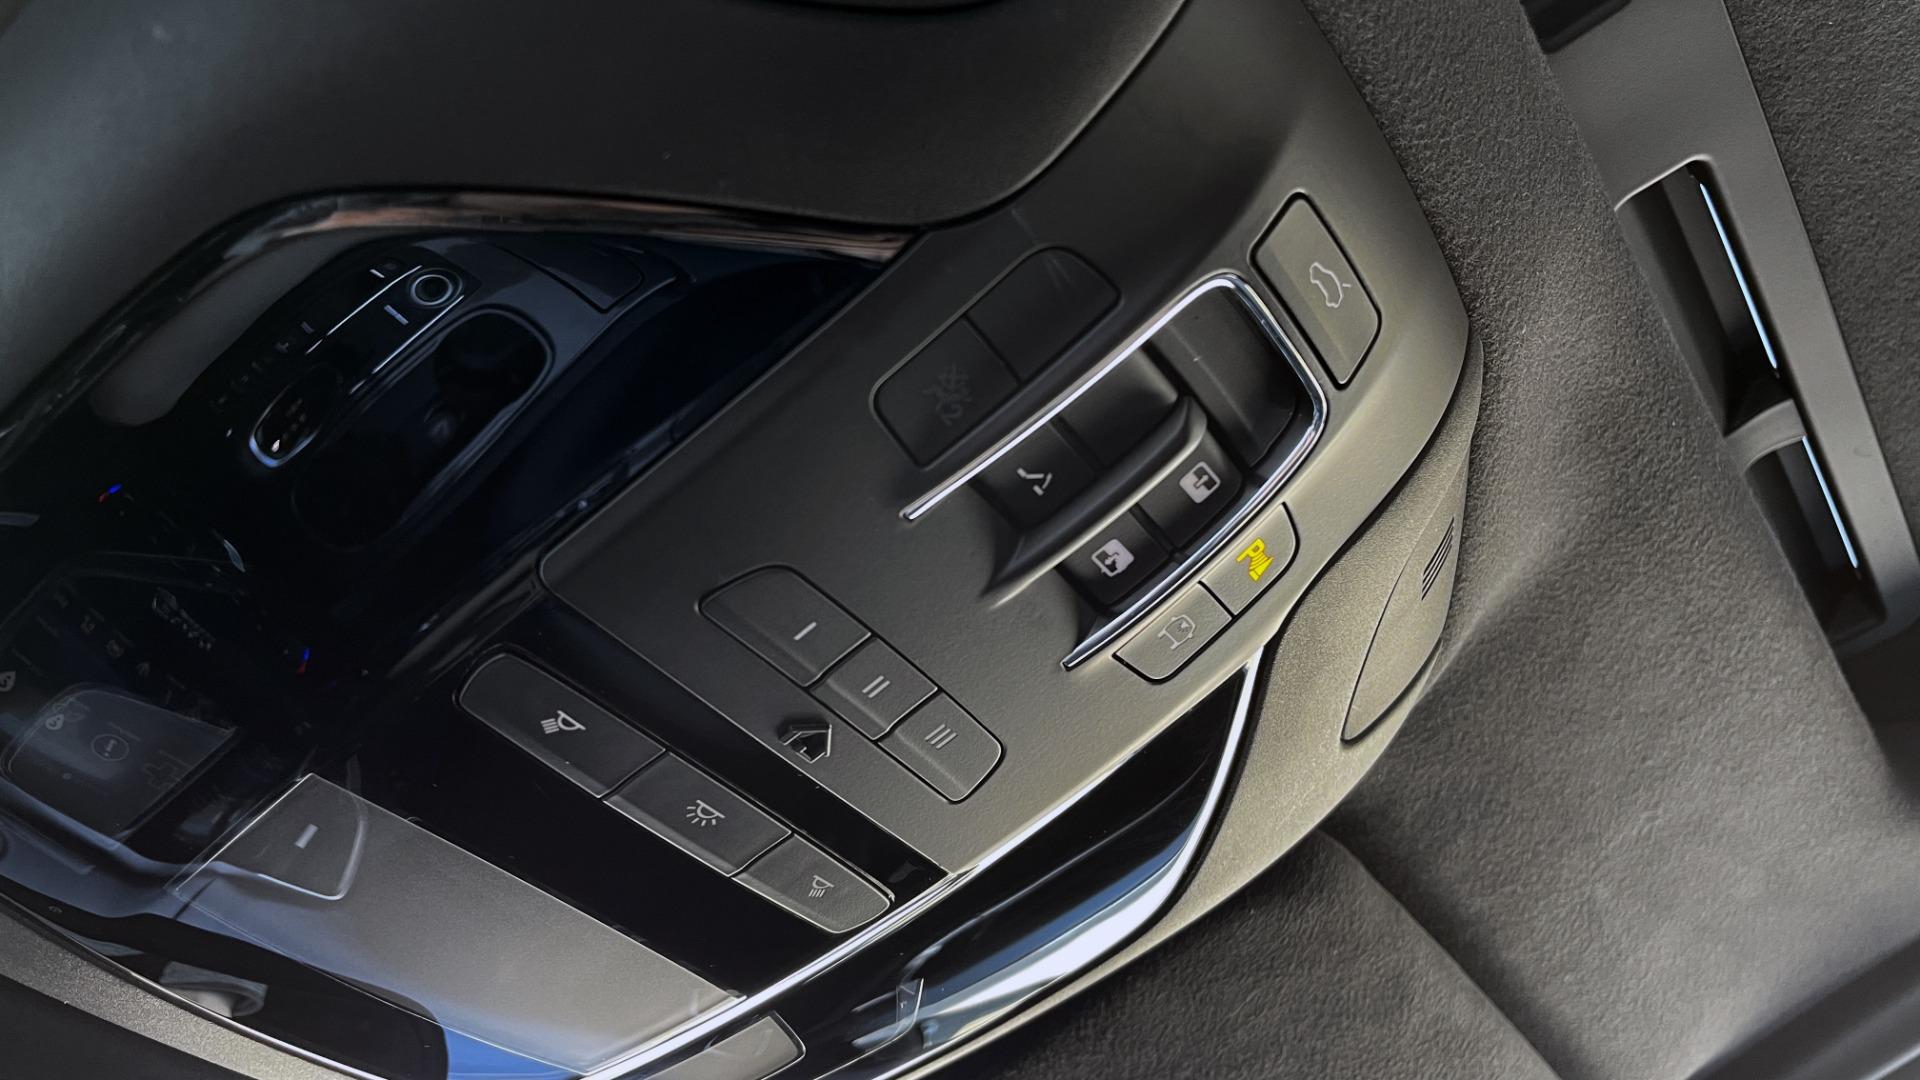 Used 2018 Maserati GHIBLI SEDAN / RWD / 3.0L V6 / SUNROOF / NAV / REARVIEW for sale $42,995 at Formula Imports in Charlotte NC 28227 48